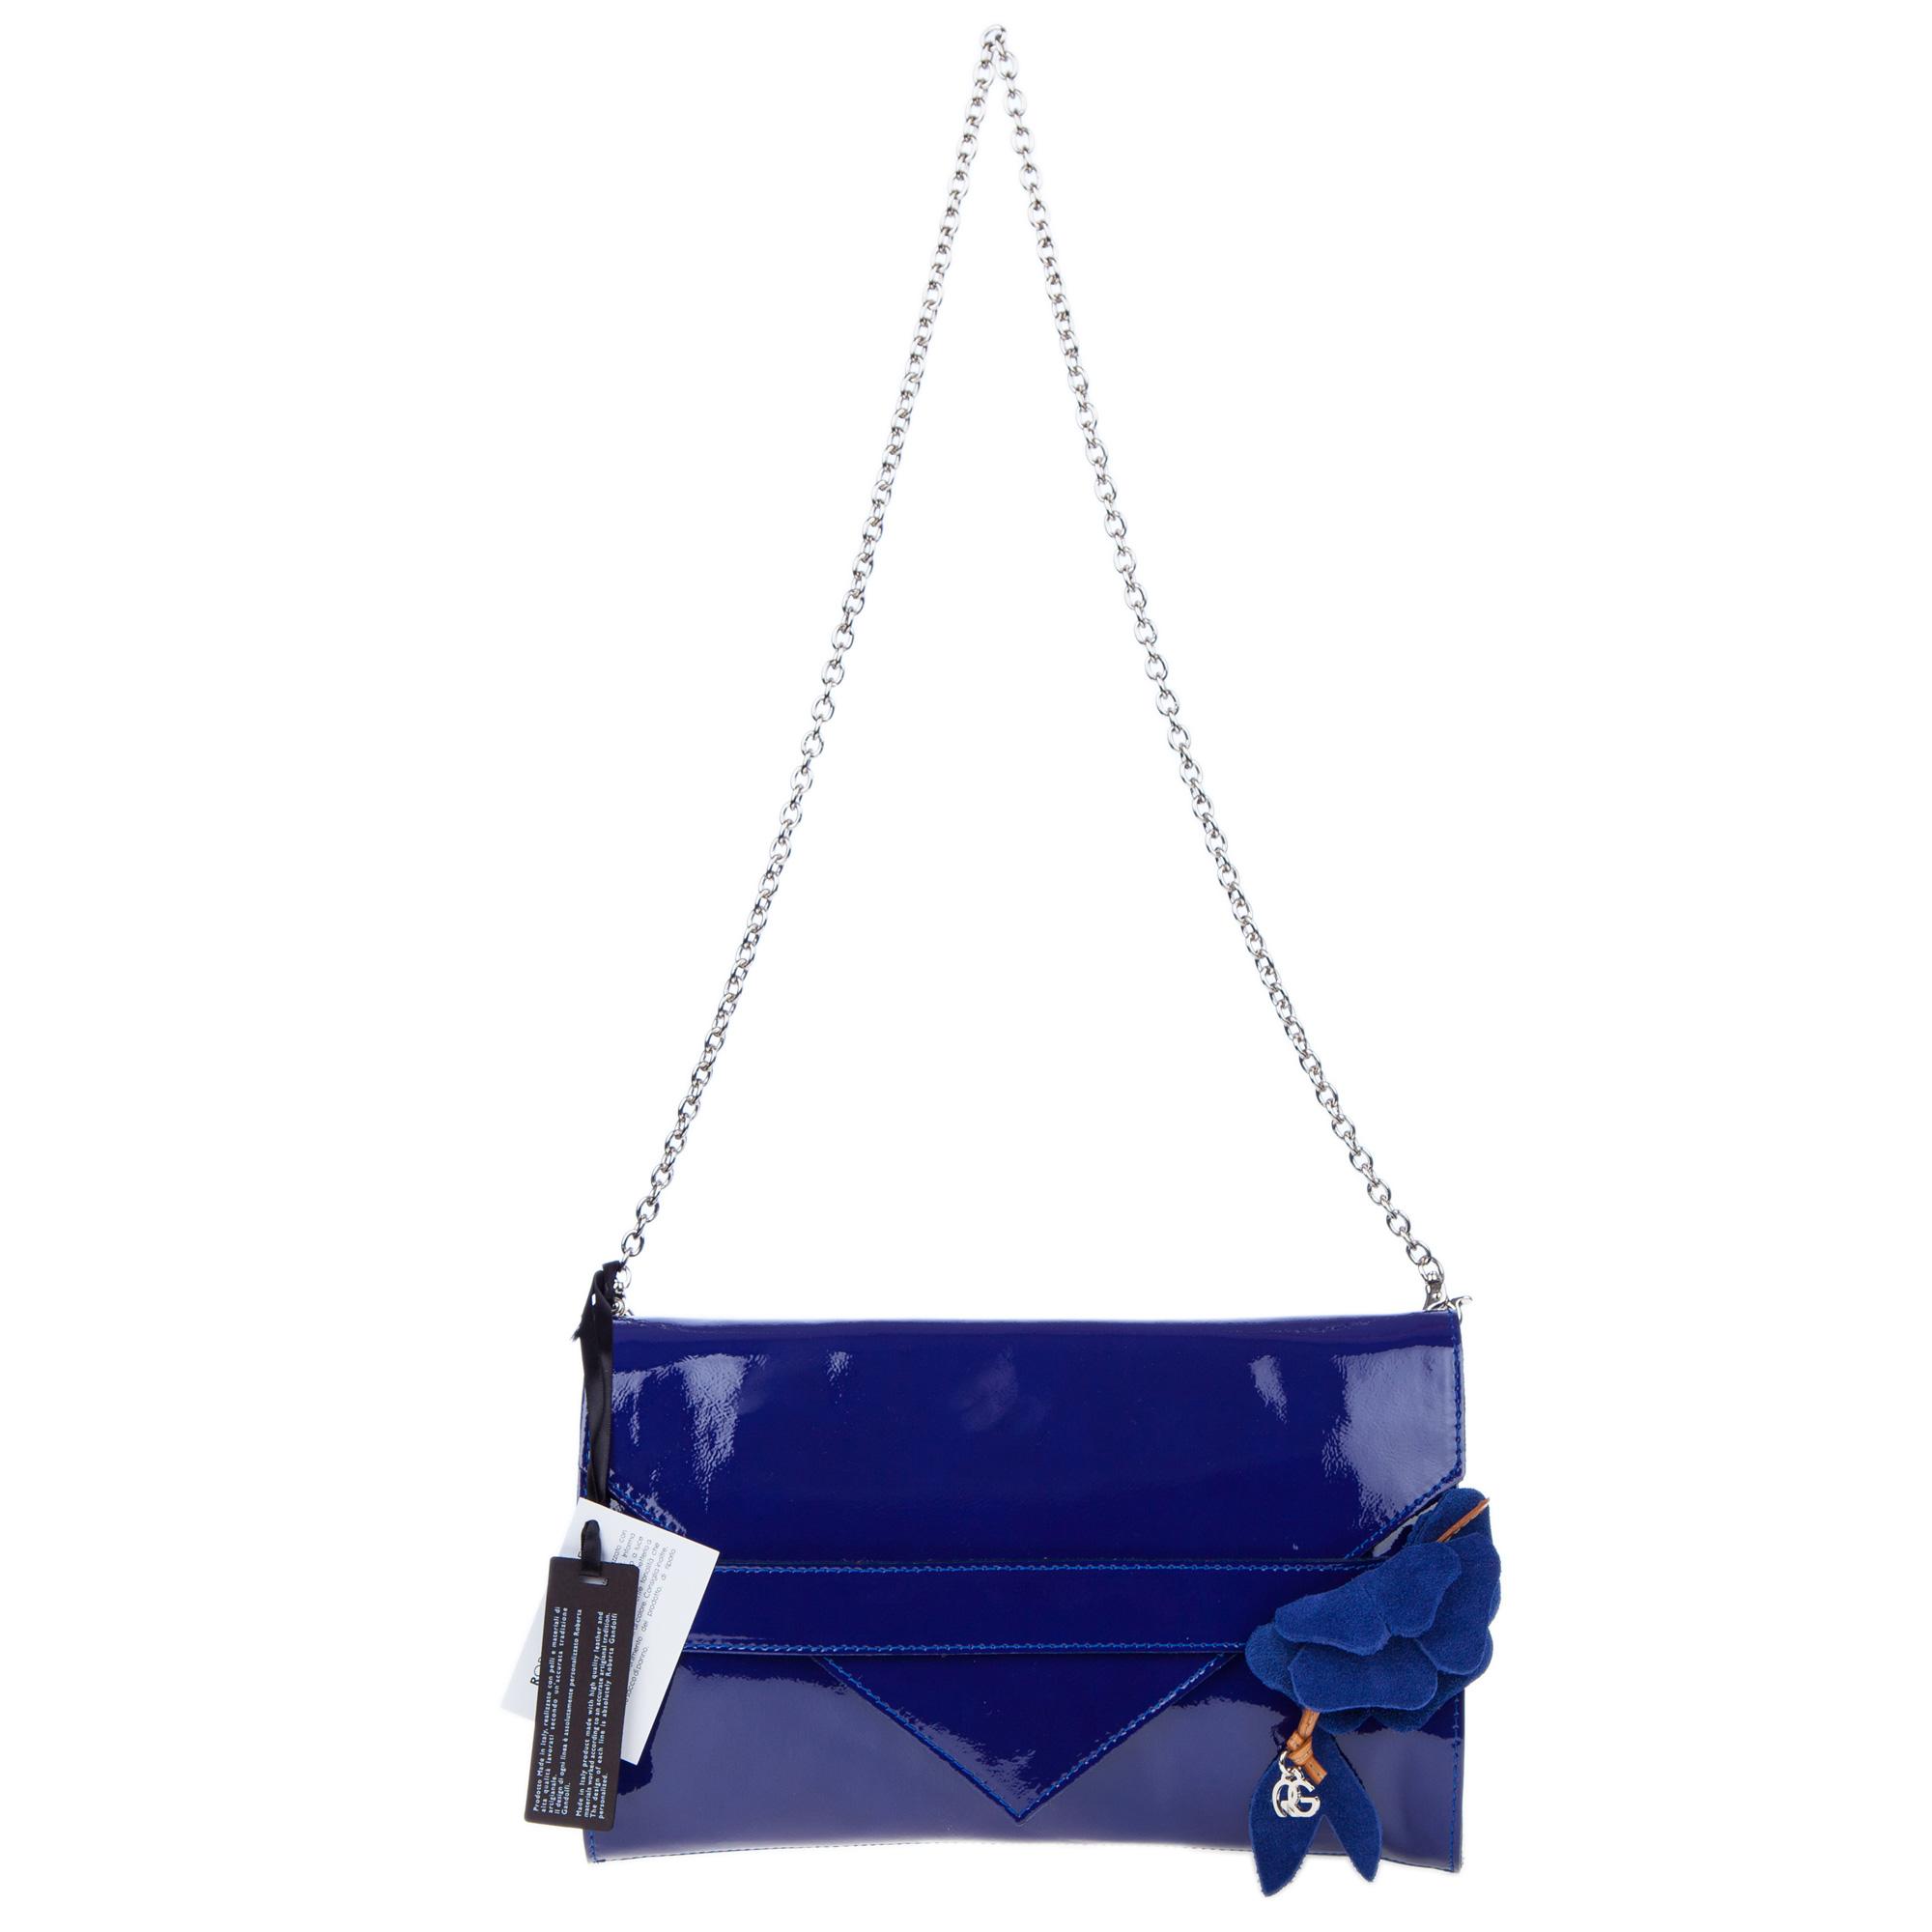 Roberta Gandolfi Italian Made Navy Blue Patent Leather Evening Bag Clutch